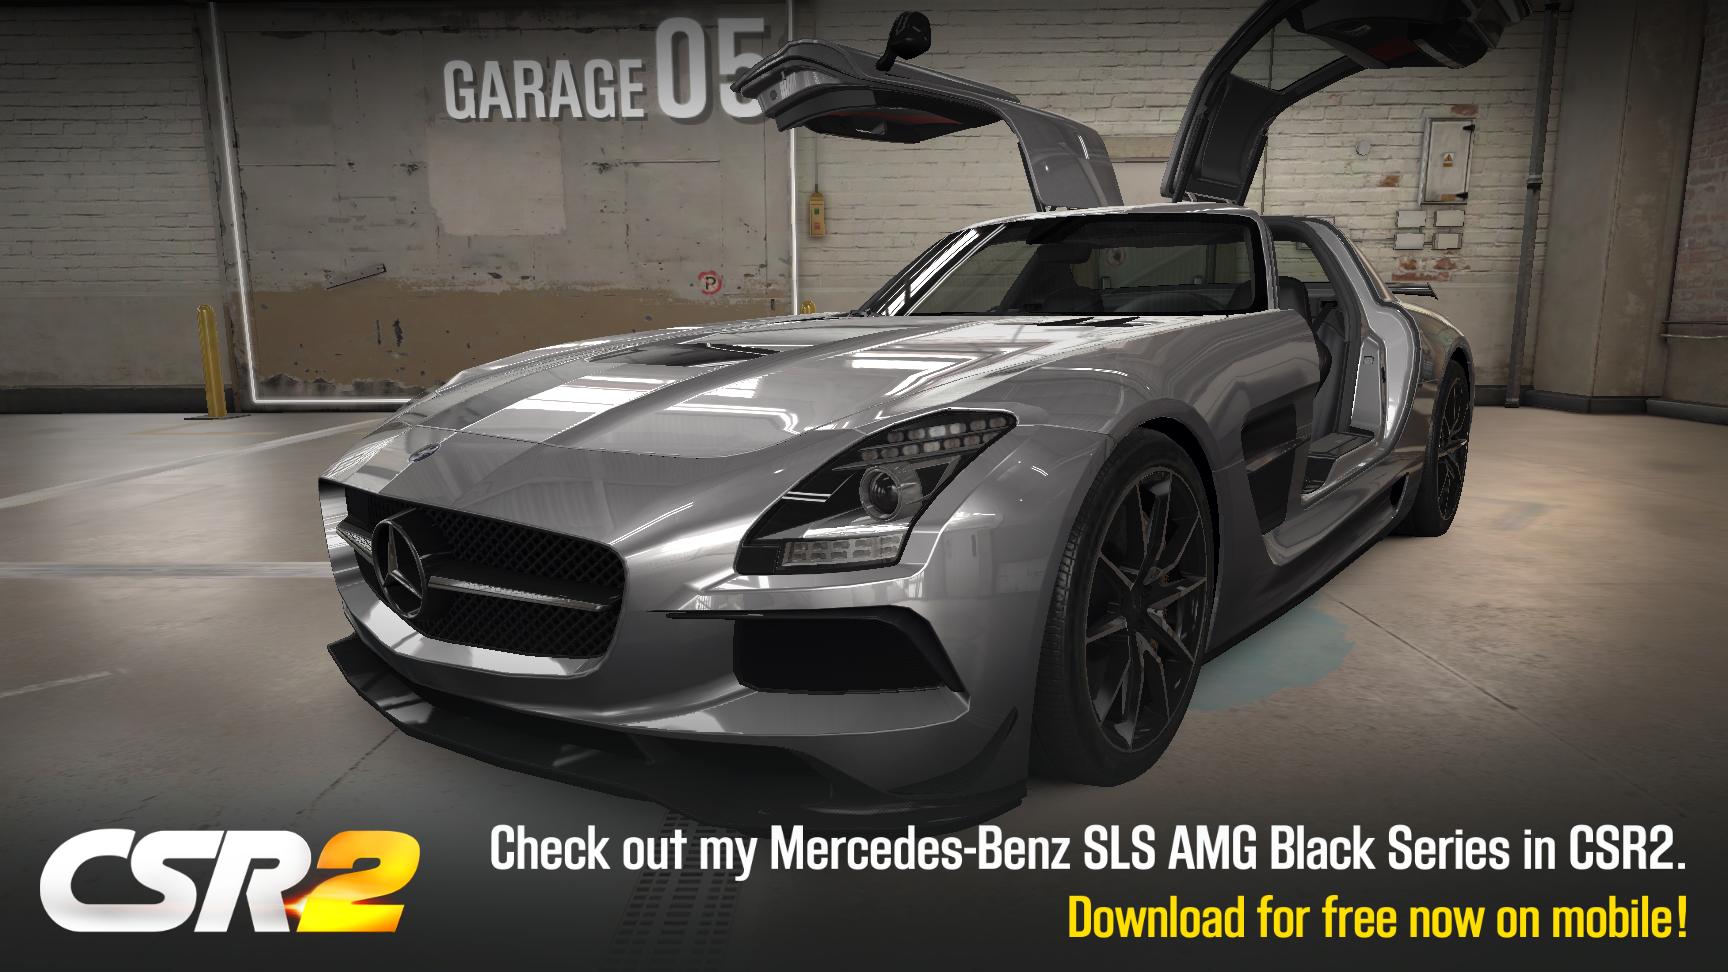 csr racing franchise car 40 mercedes benz sls amg black series from